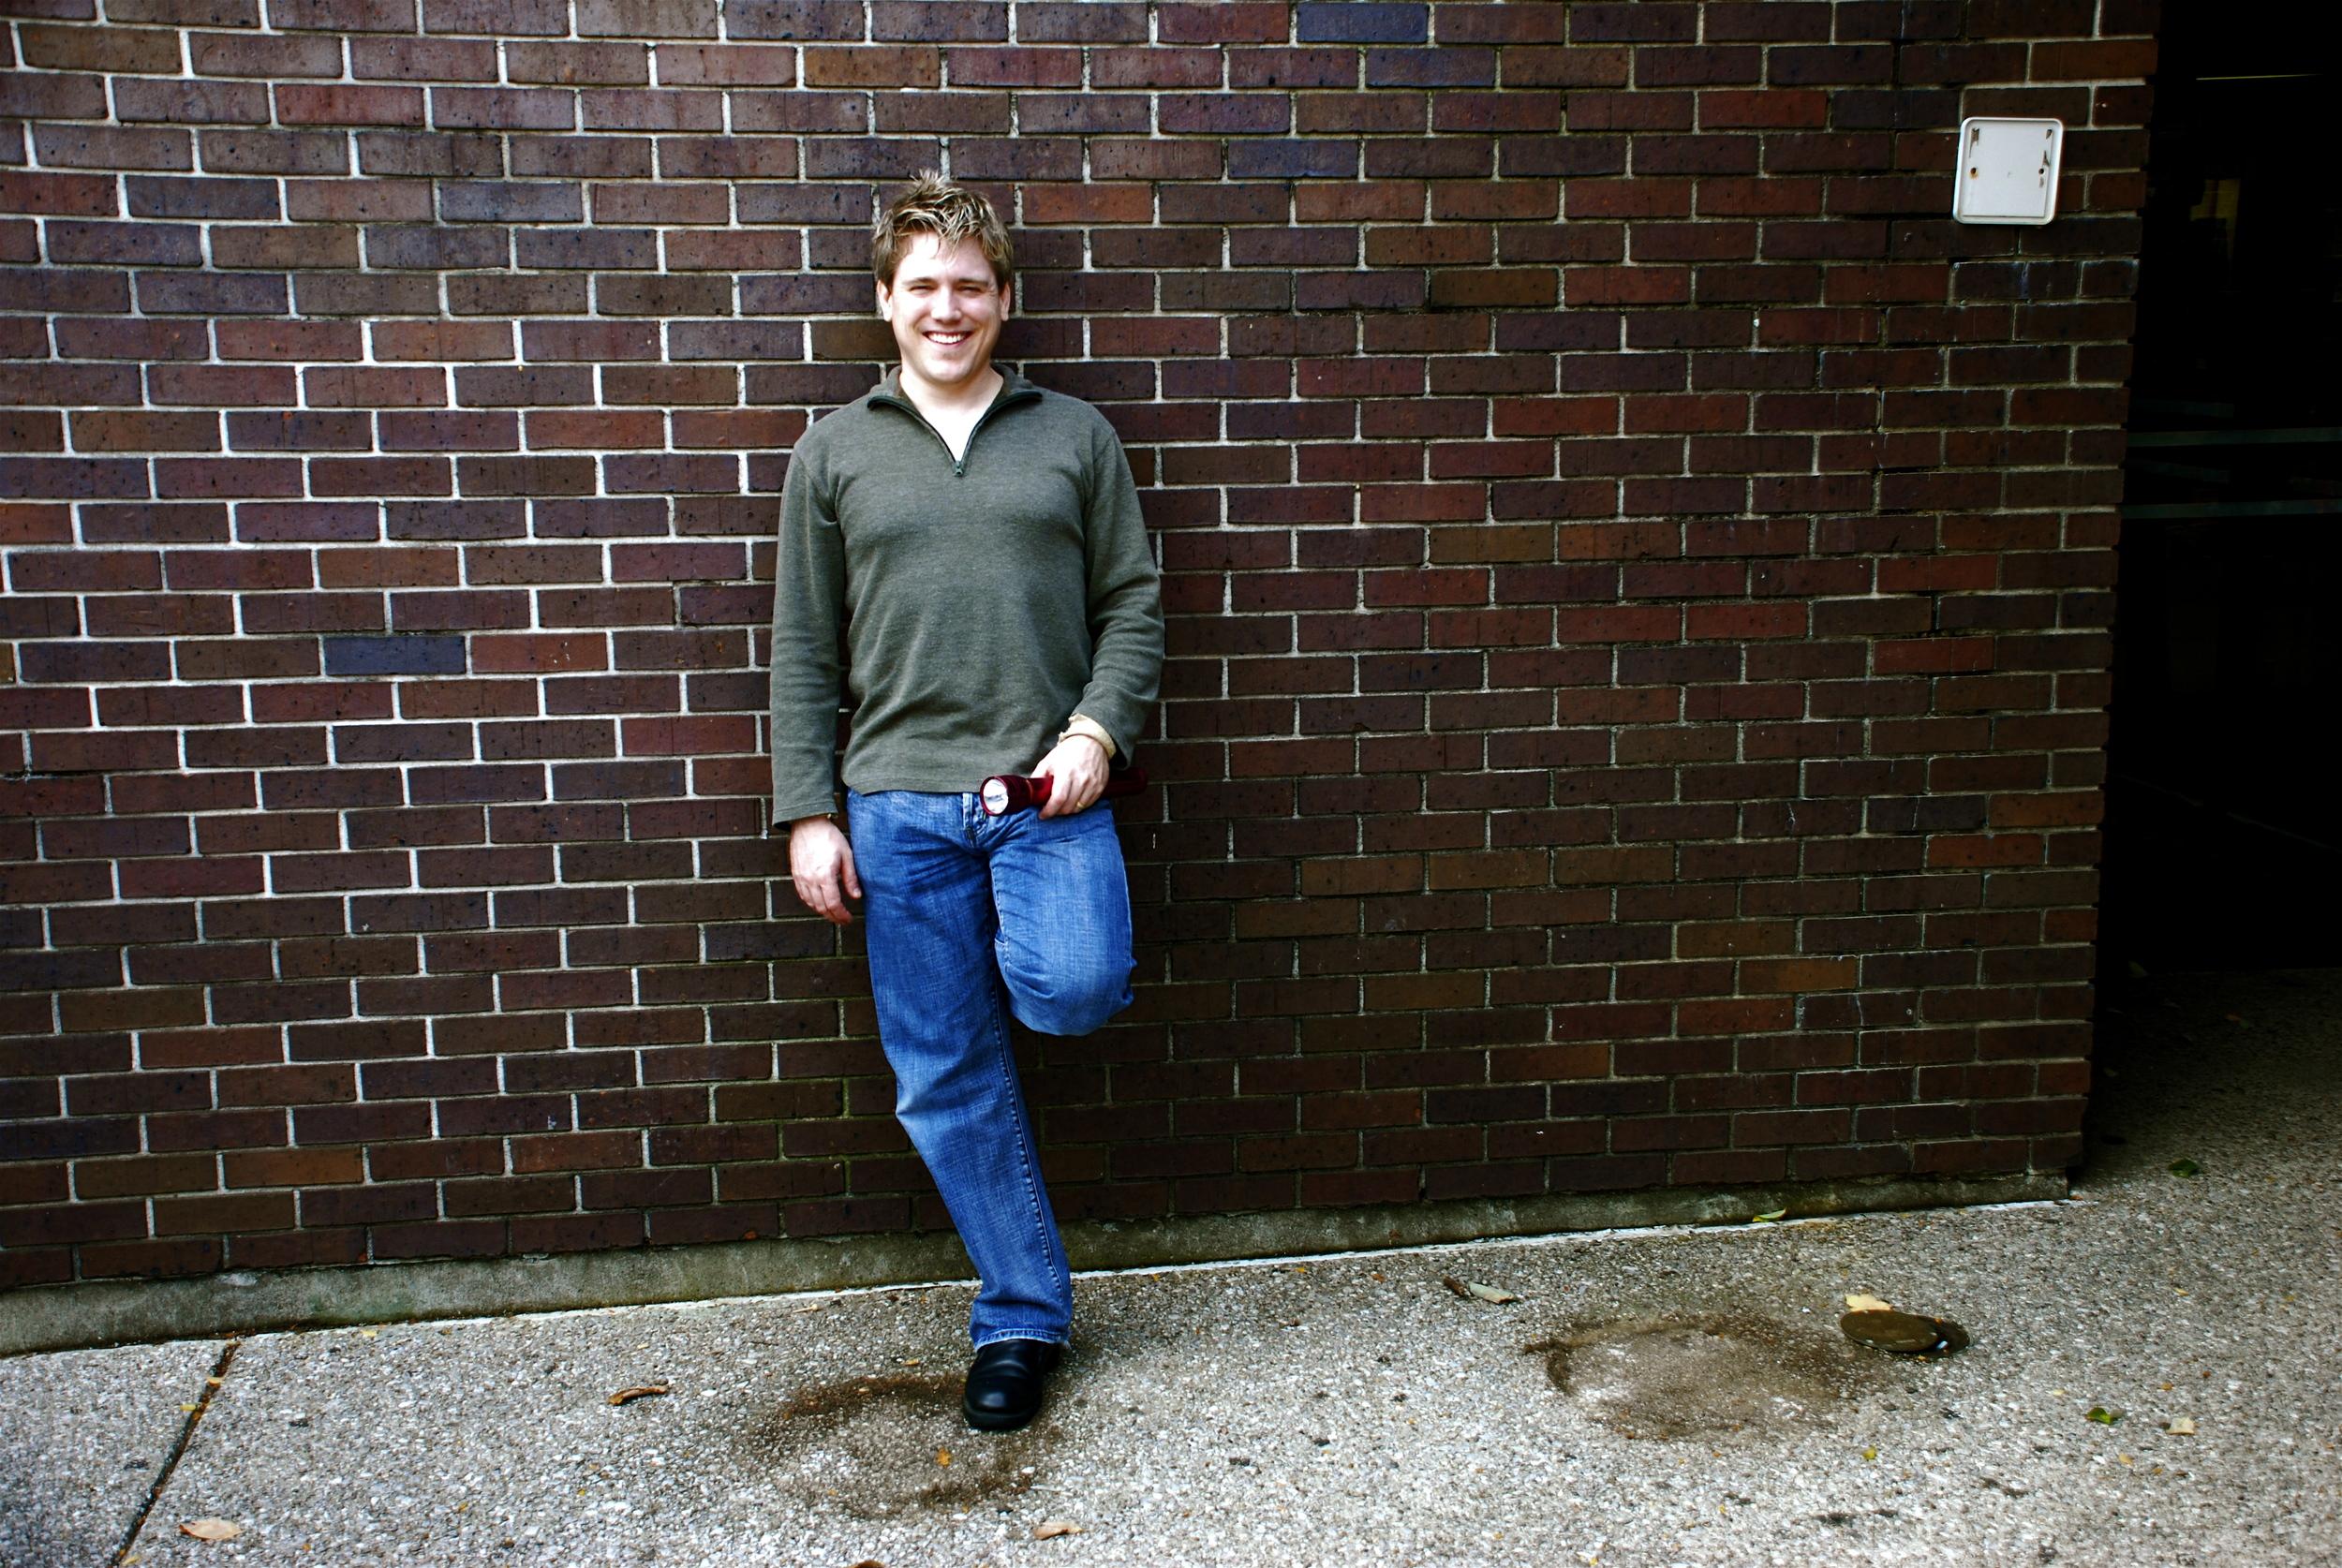 Billy standing against wall DSC_0288.jpg